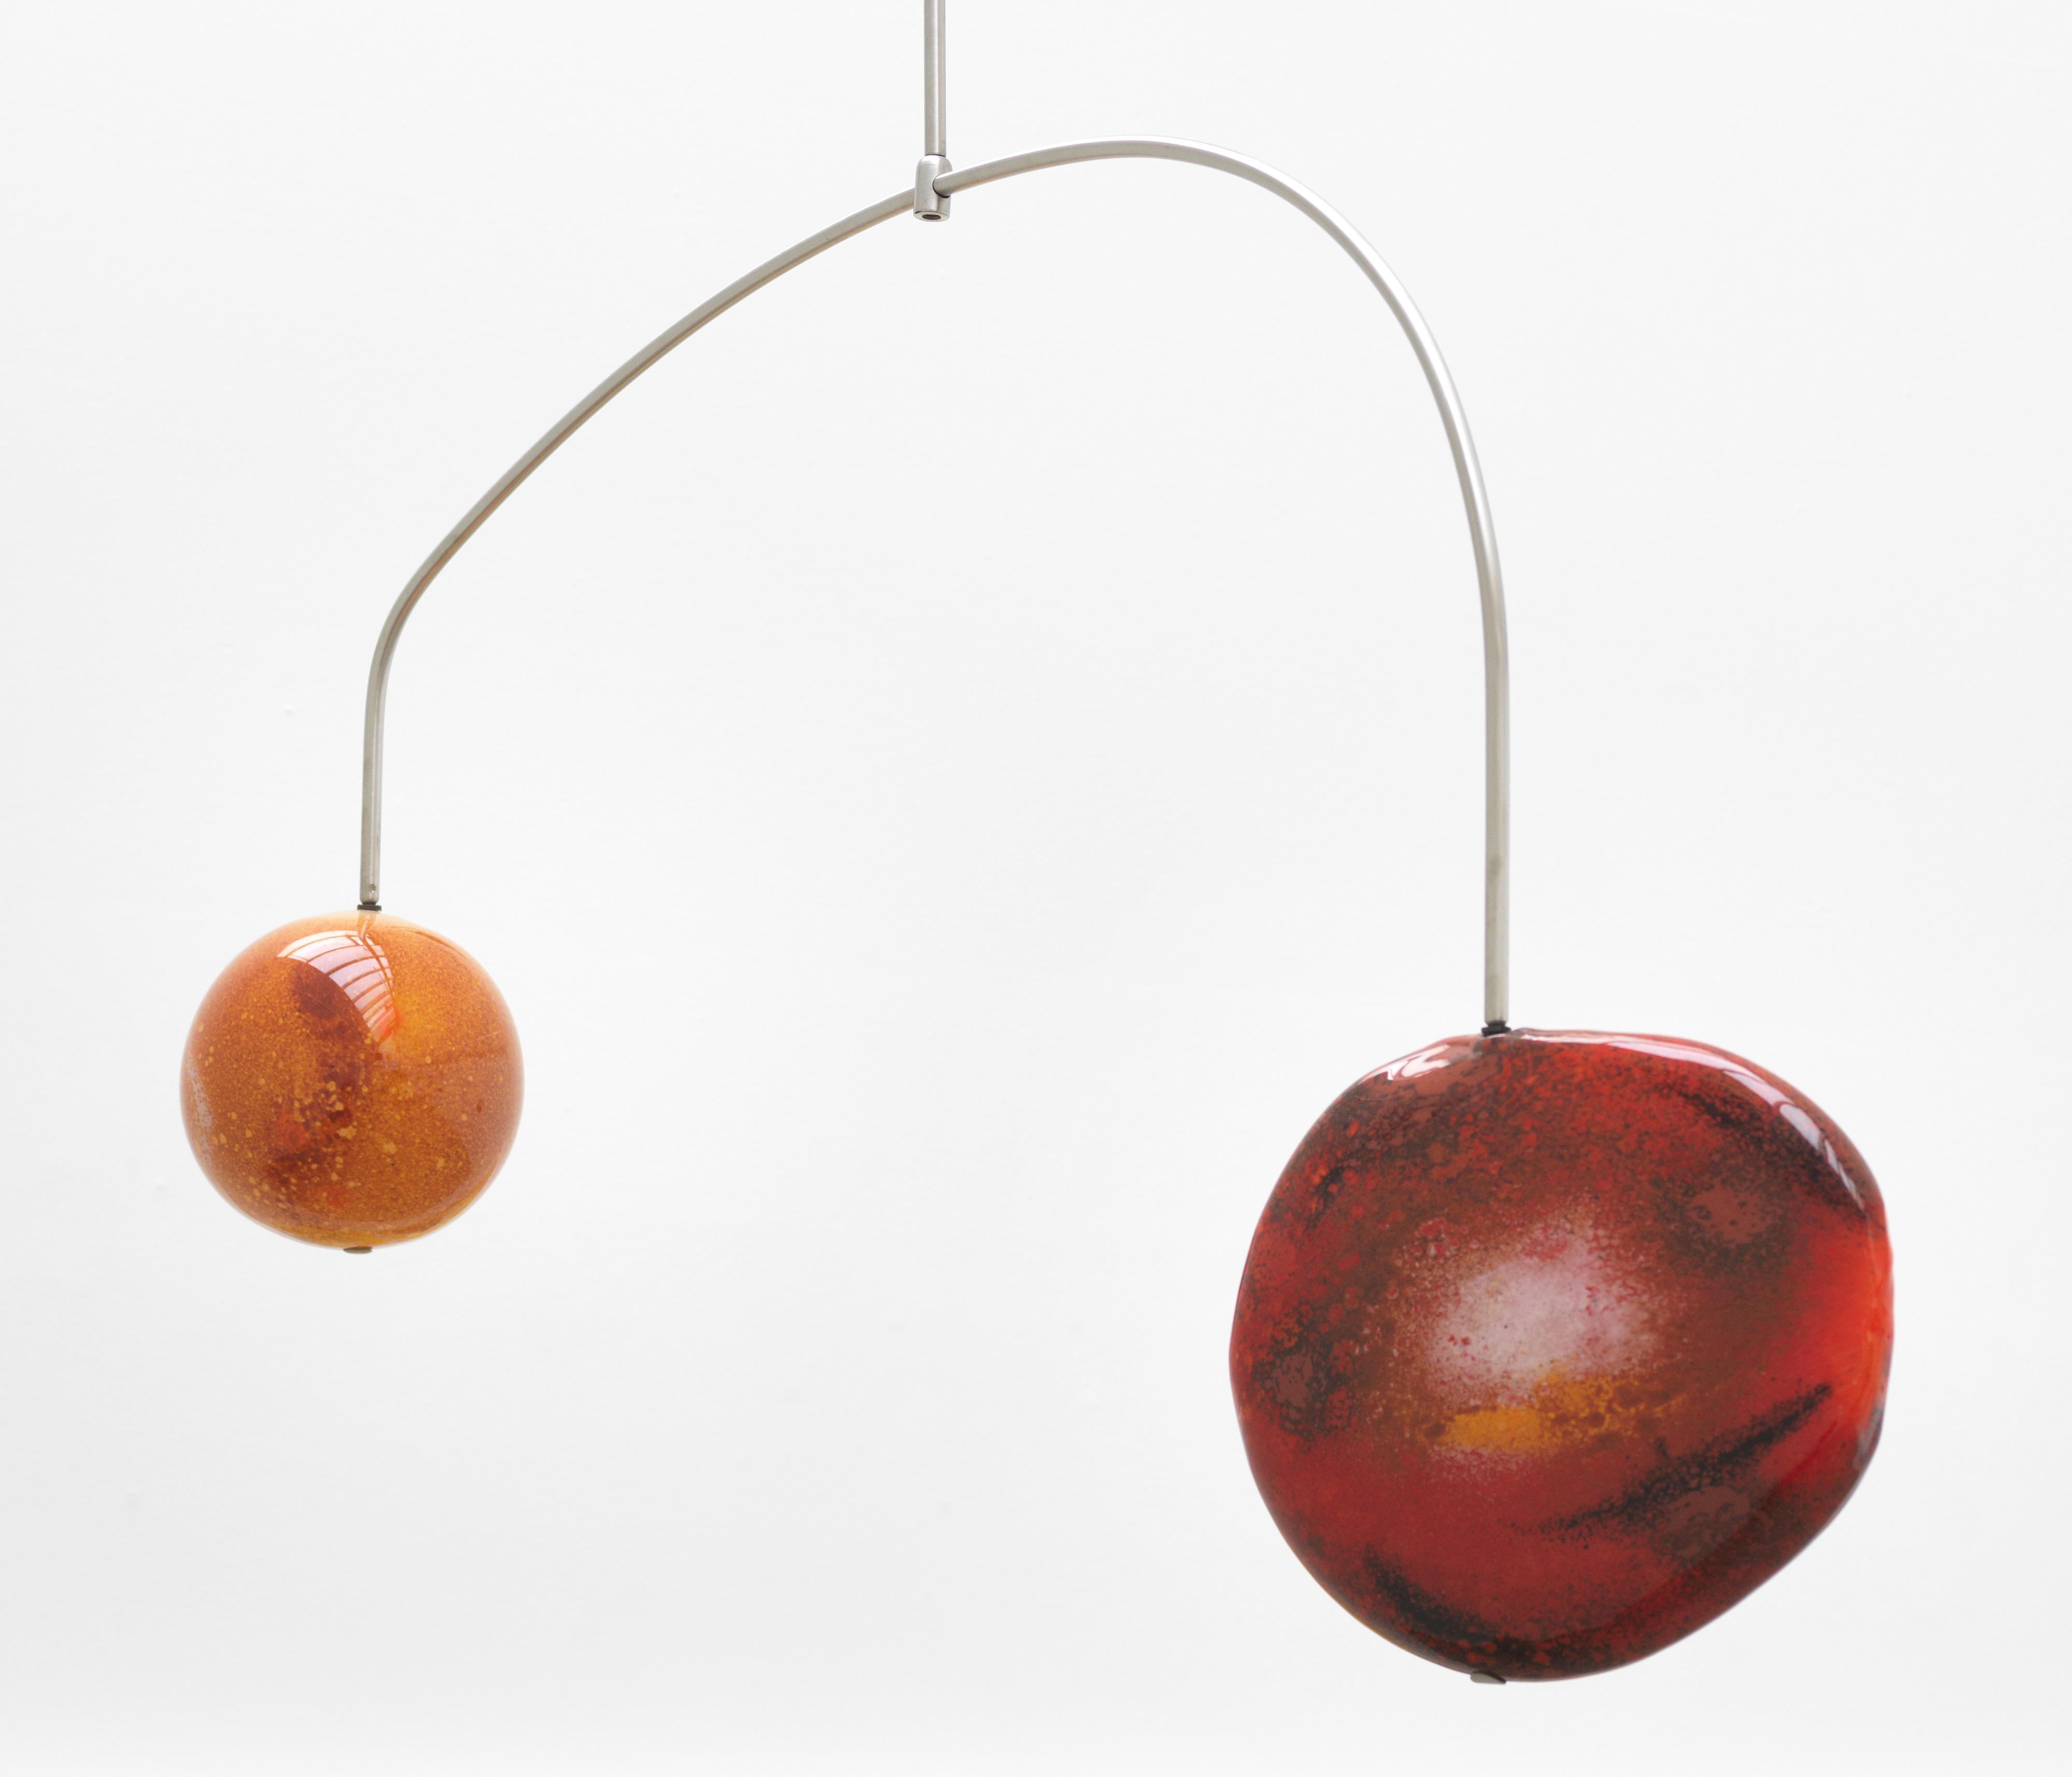 Galerie Barbara Thumm \ María Magdalena Campos-Pons – Mobile #4, 2021, MCP-21-002 \ Mobile #4 (2021)